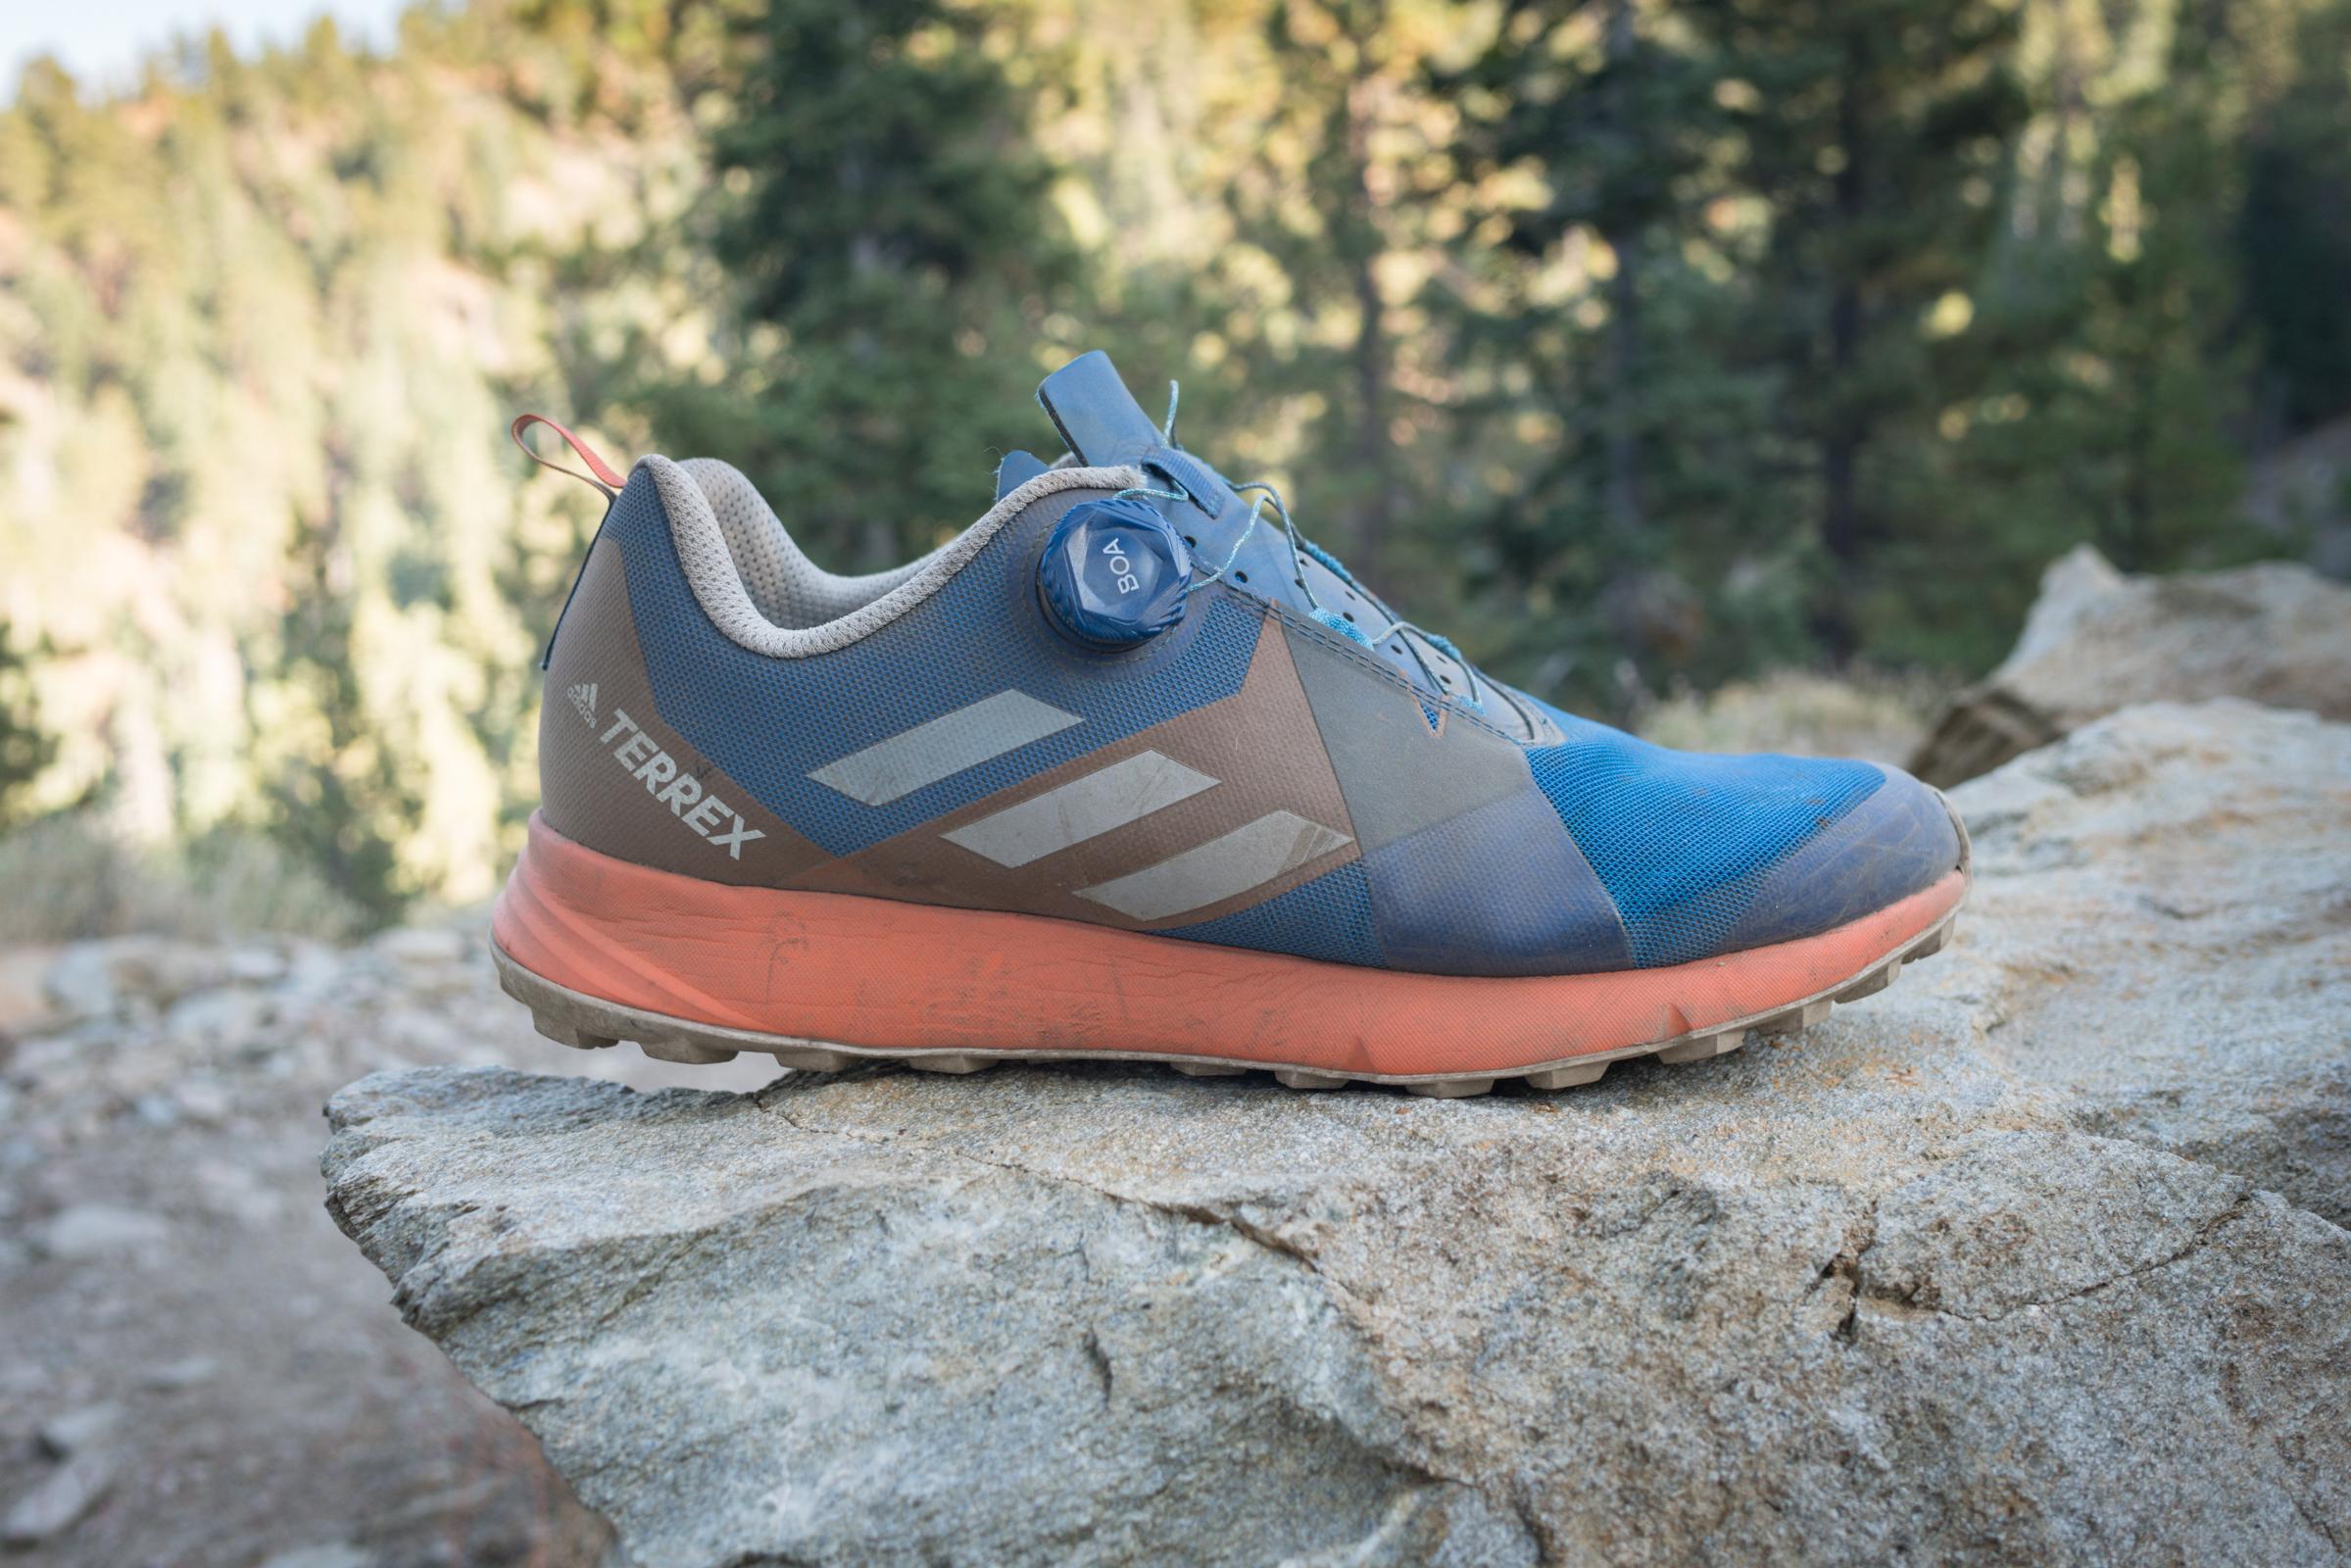 Adidas Terrex Two Boa Trail Shoe